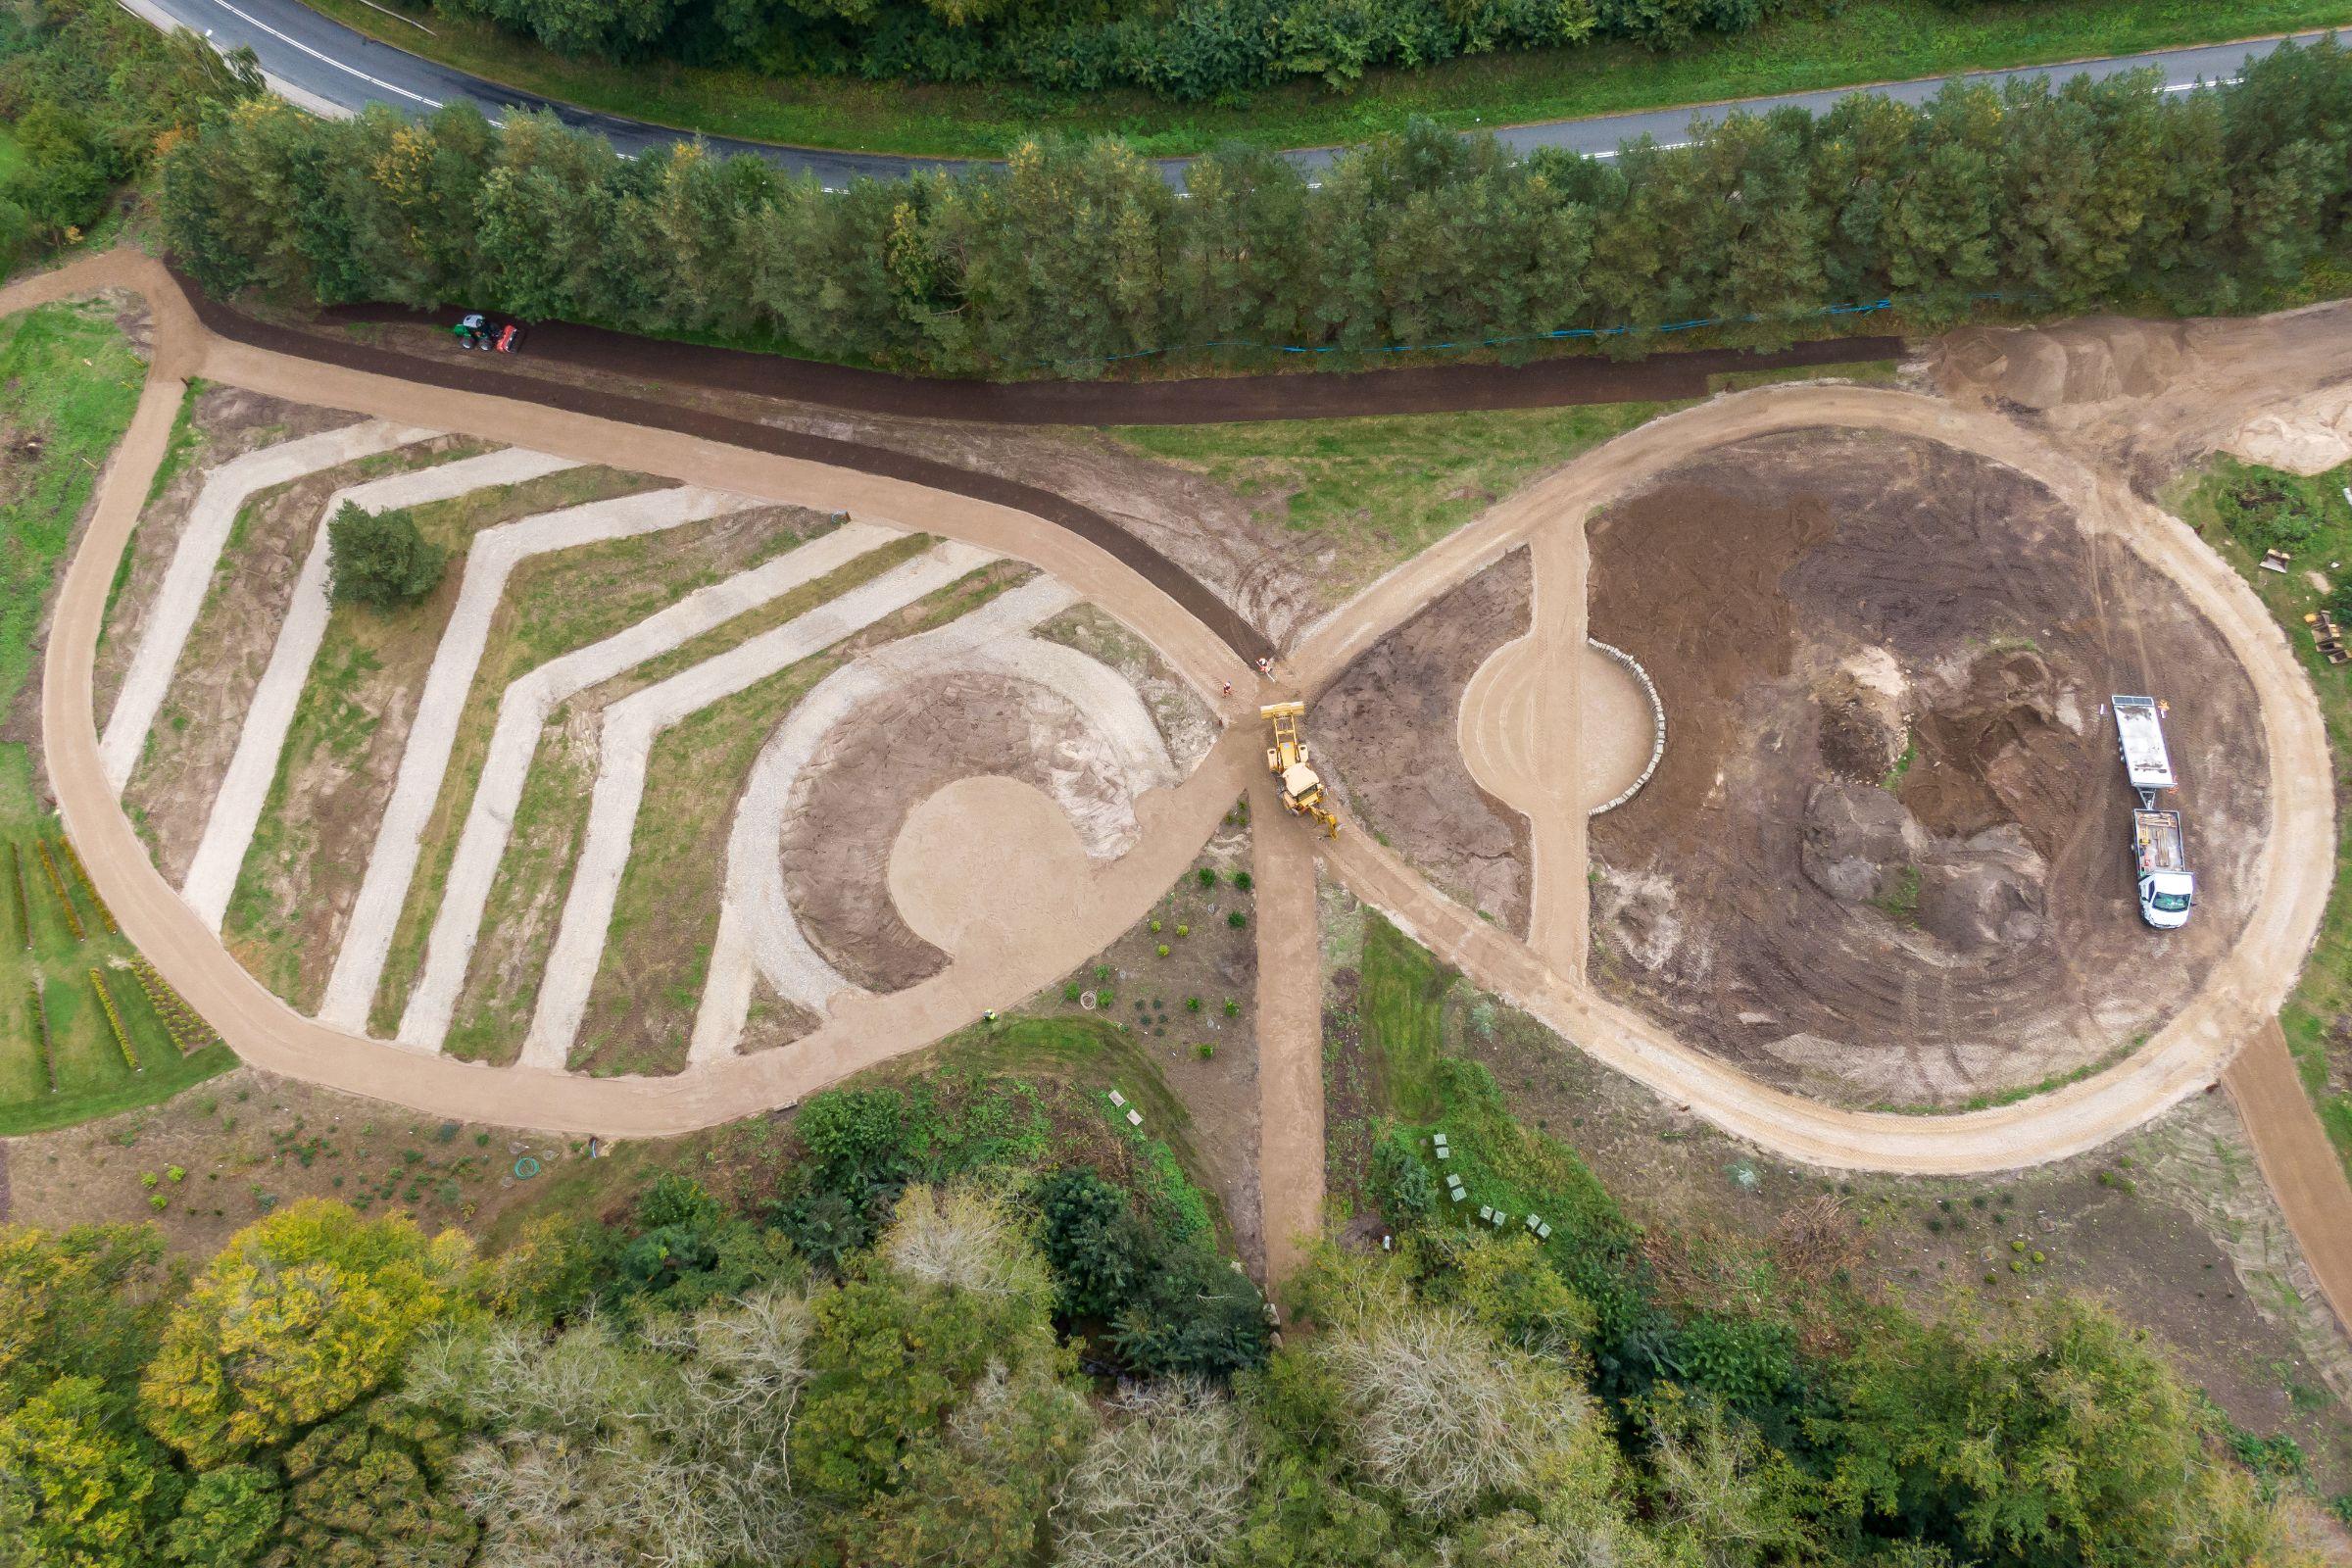 Danmarks vilde planter – Bangsbo Botaniske Have